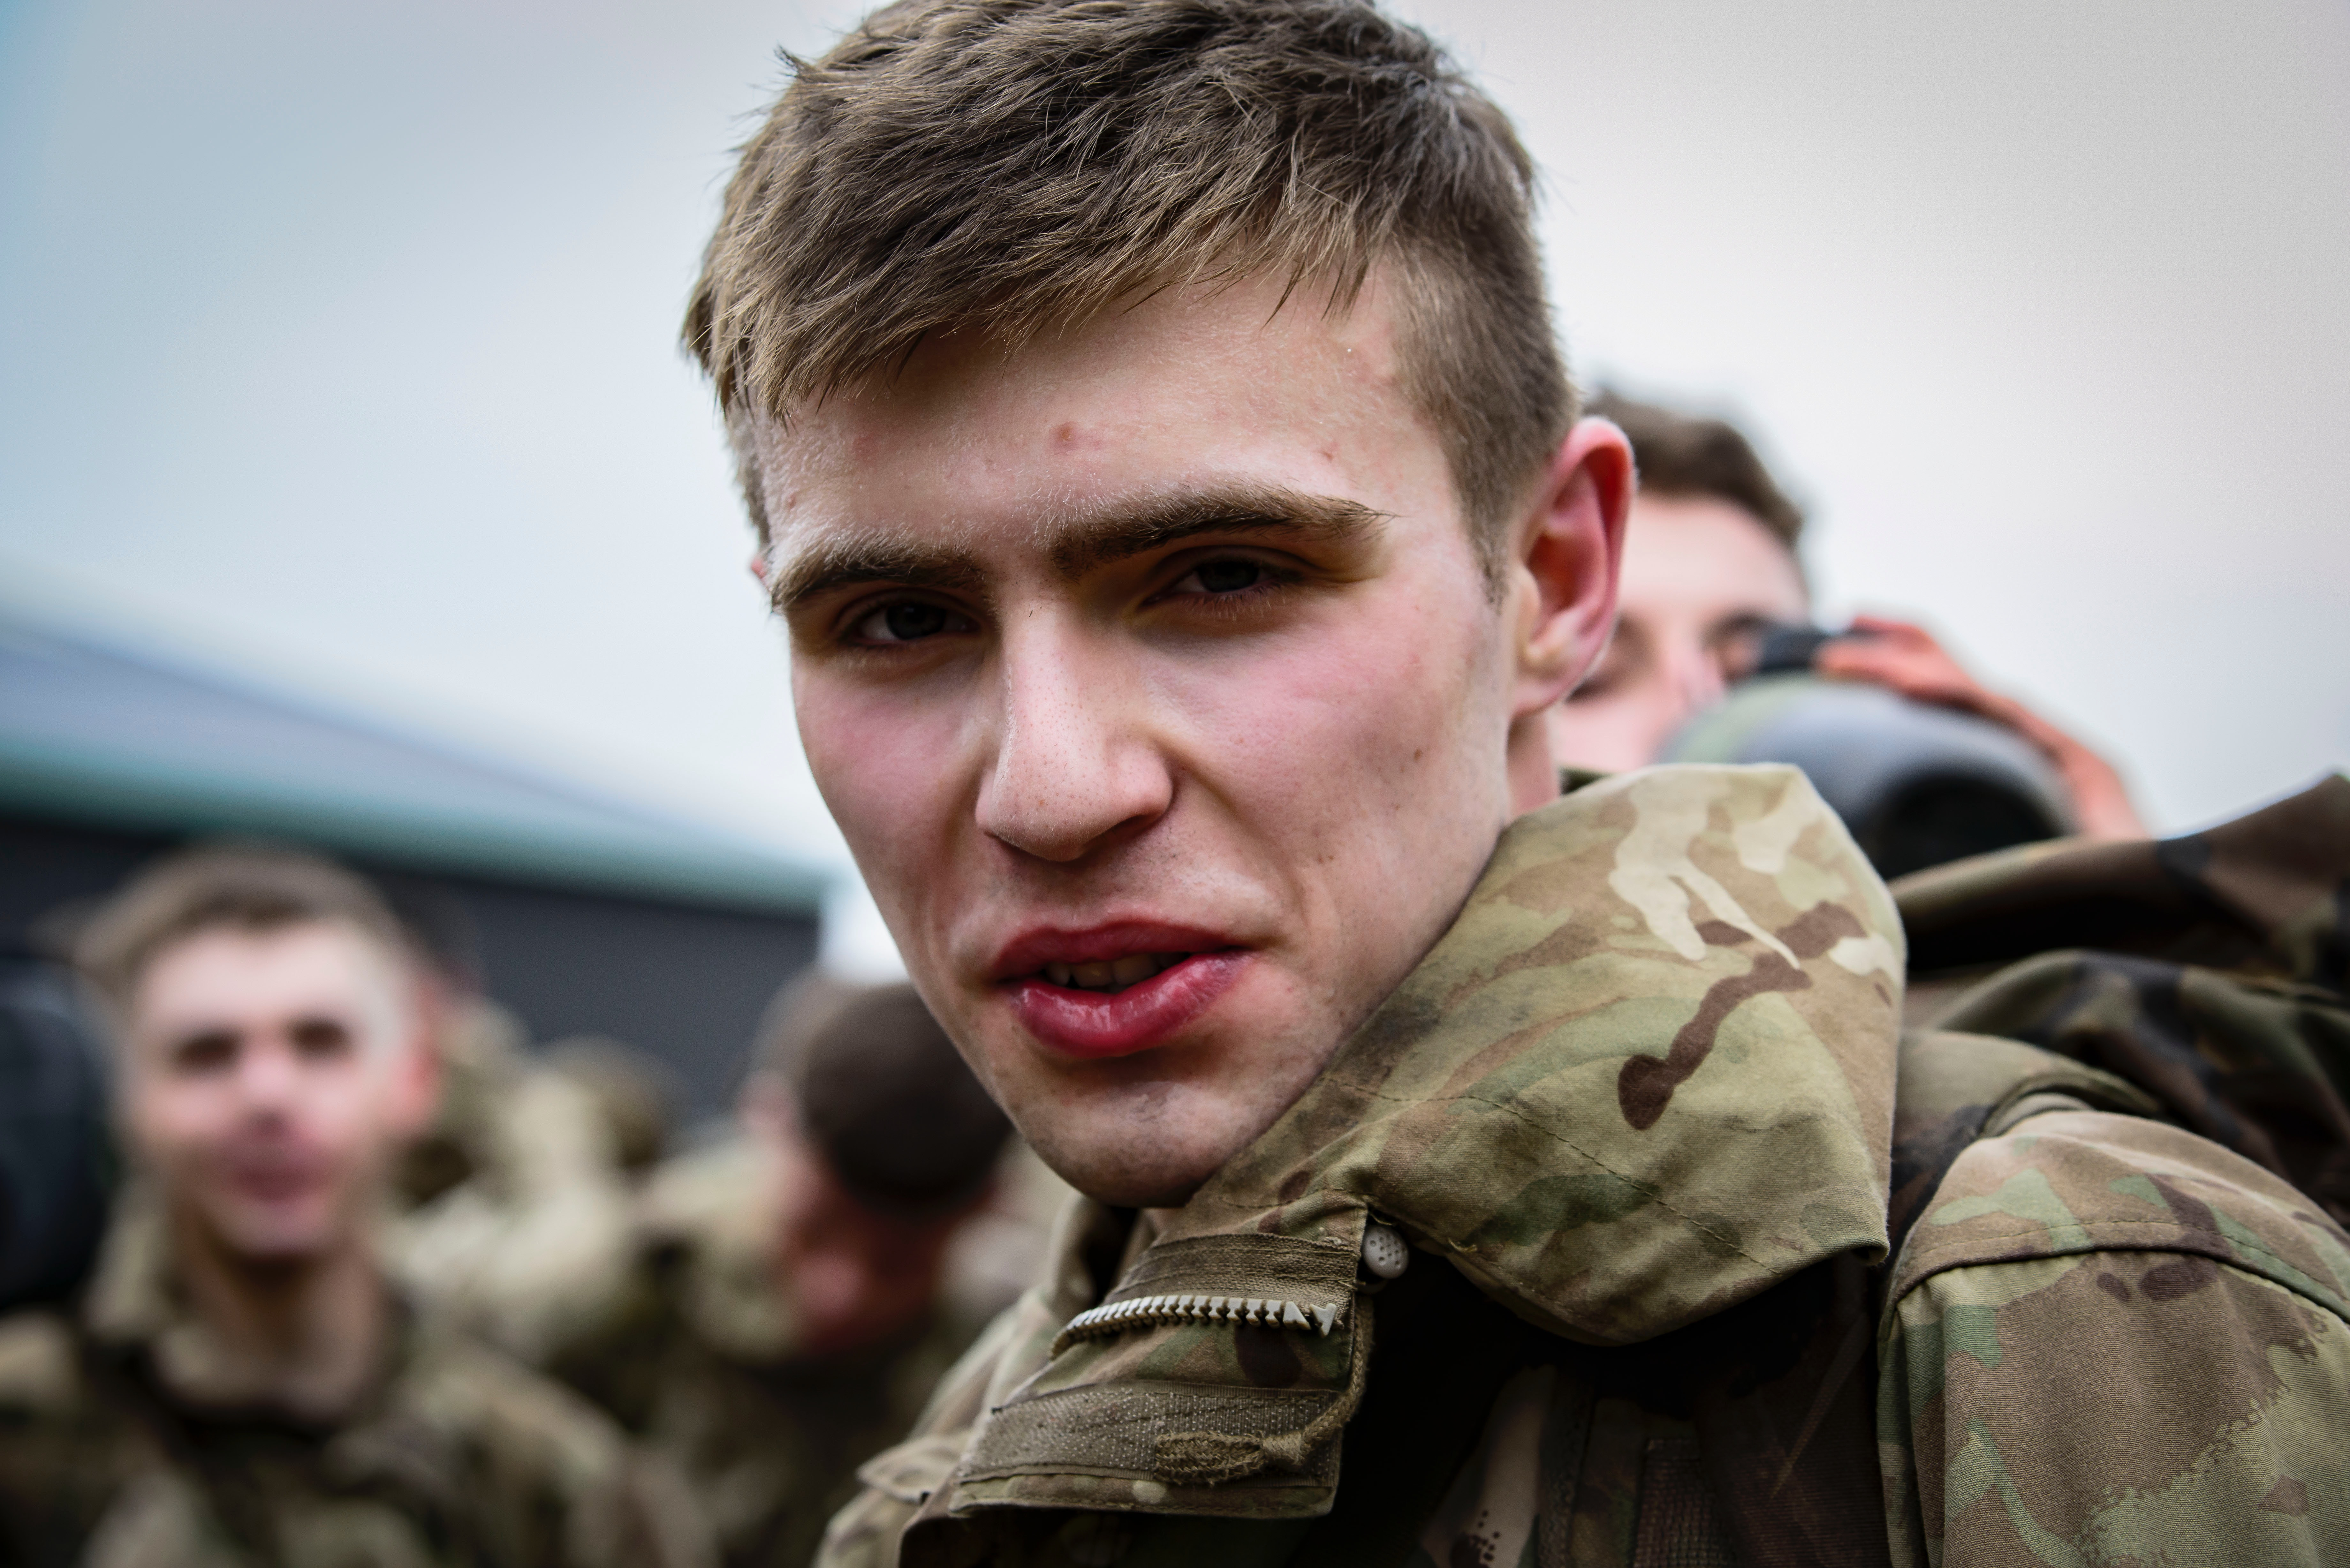 Man wearing military uniform photo